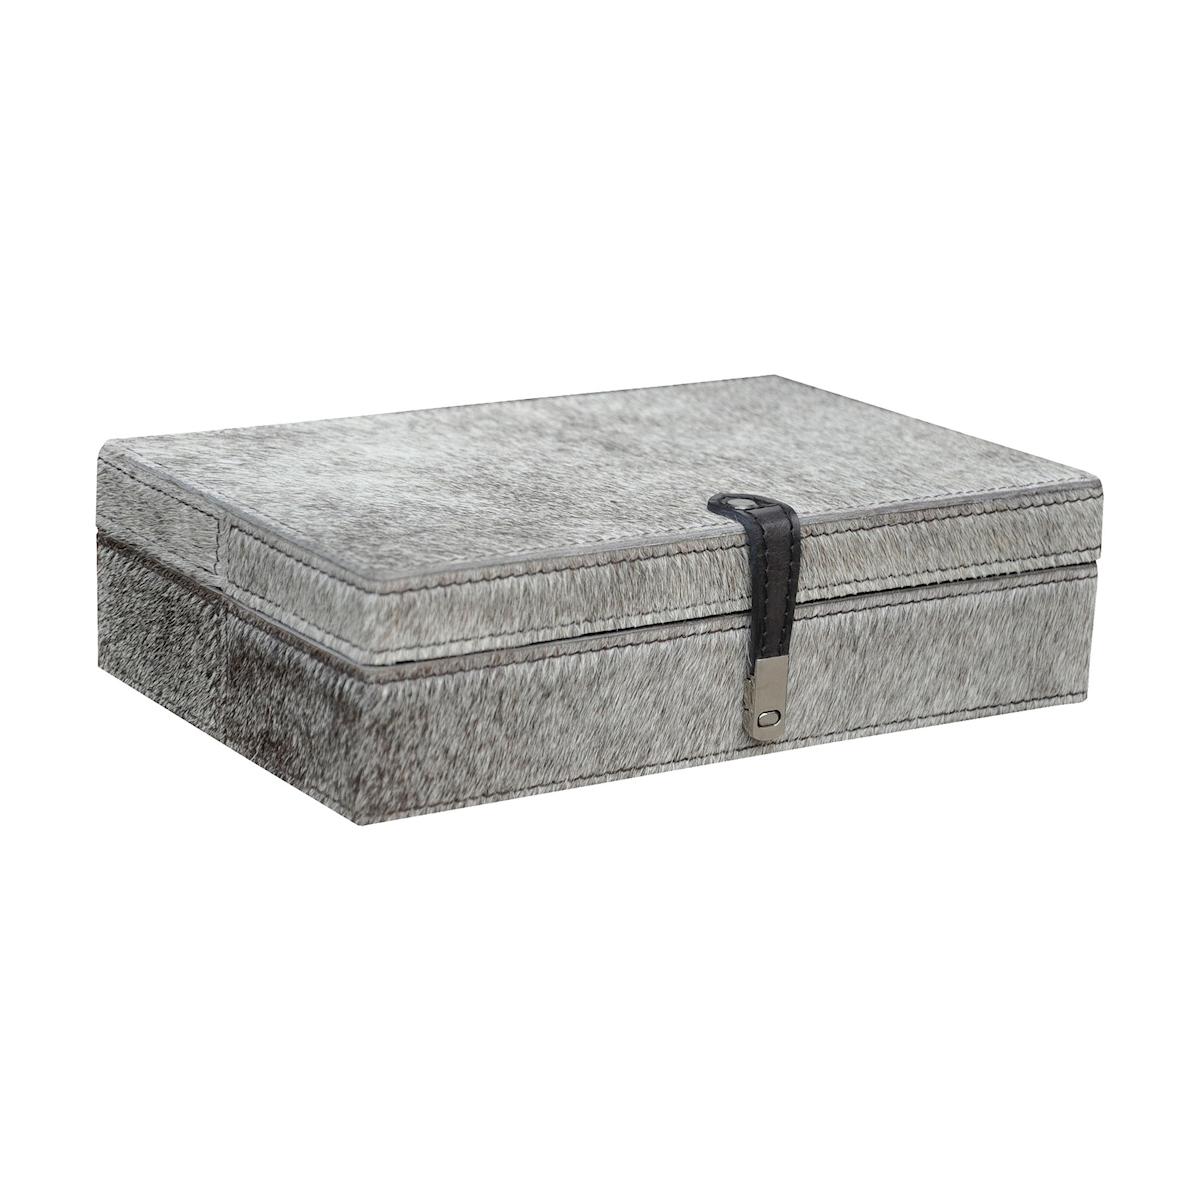 Large Grey Hairon Leather Box | Elk Home